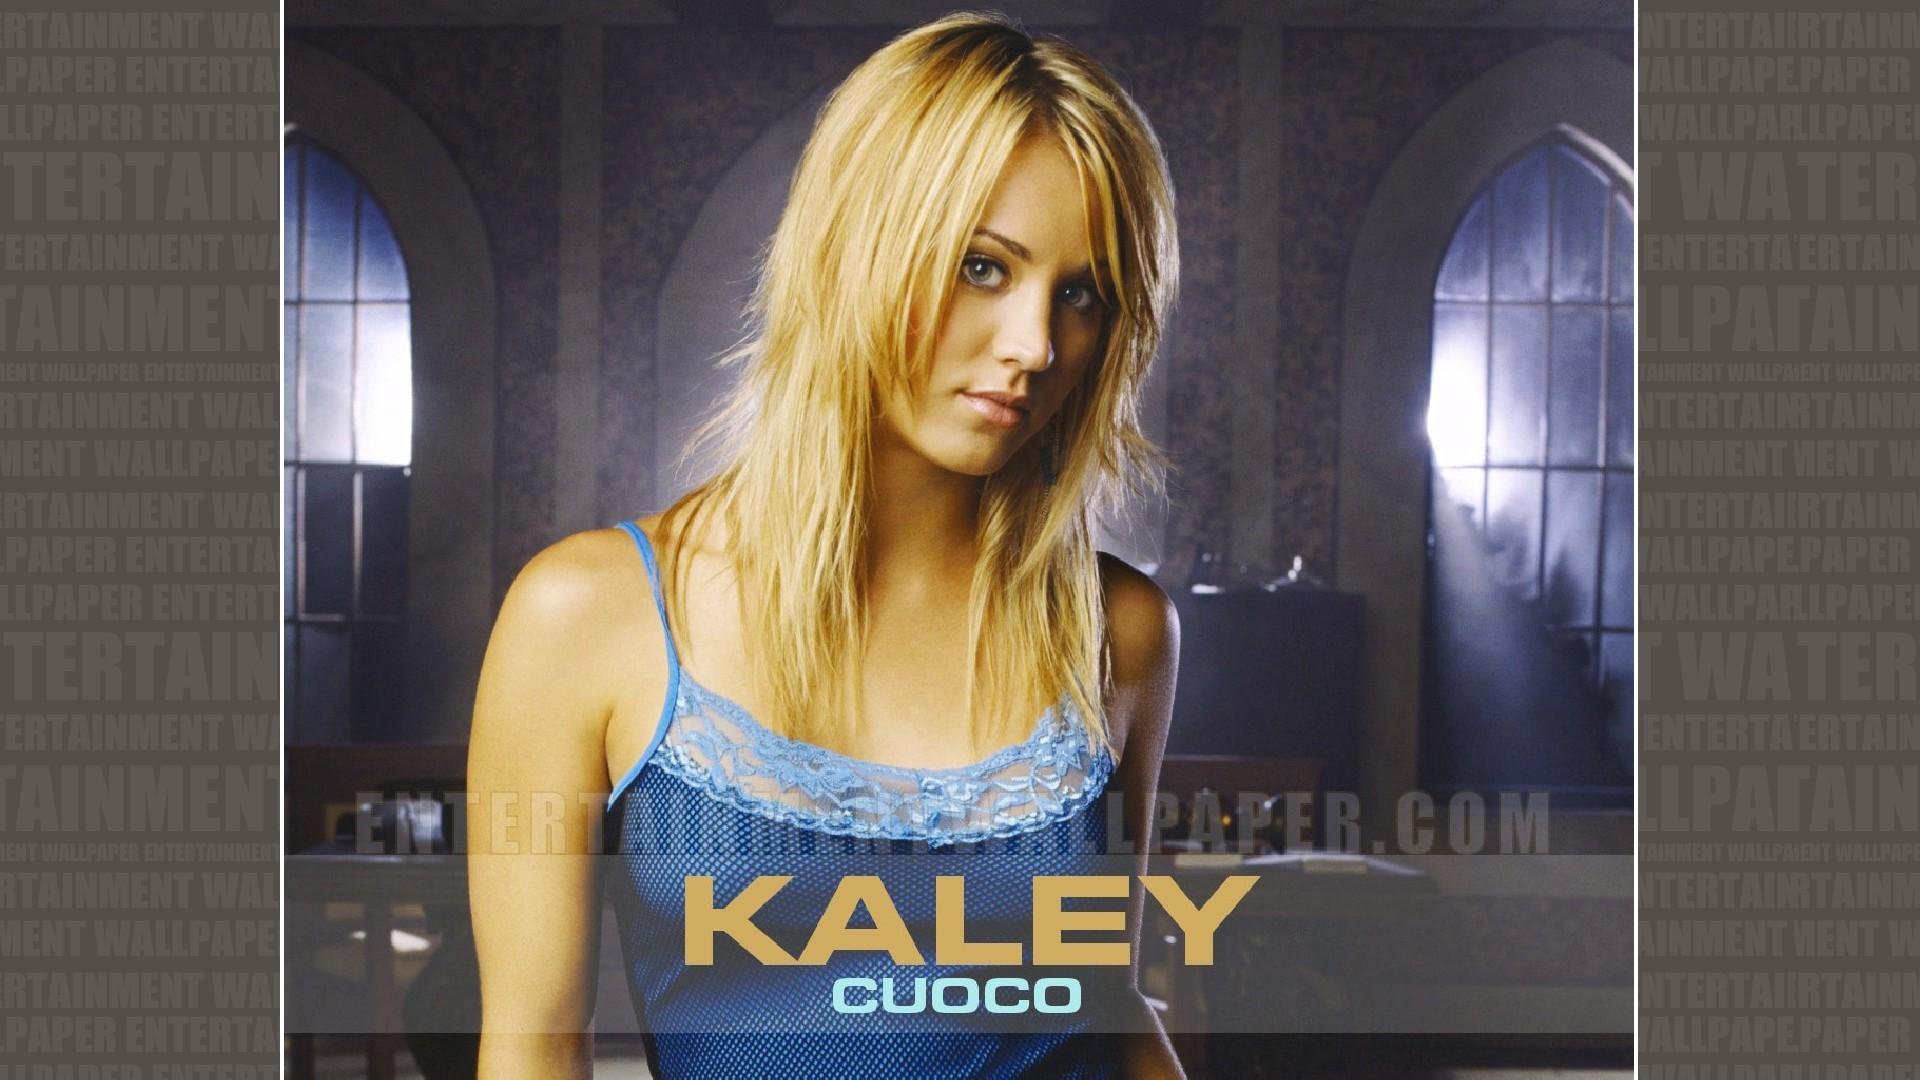 Kaley Cuoco Wallpaper – Original size, download now.